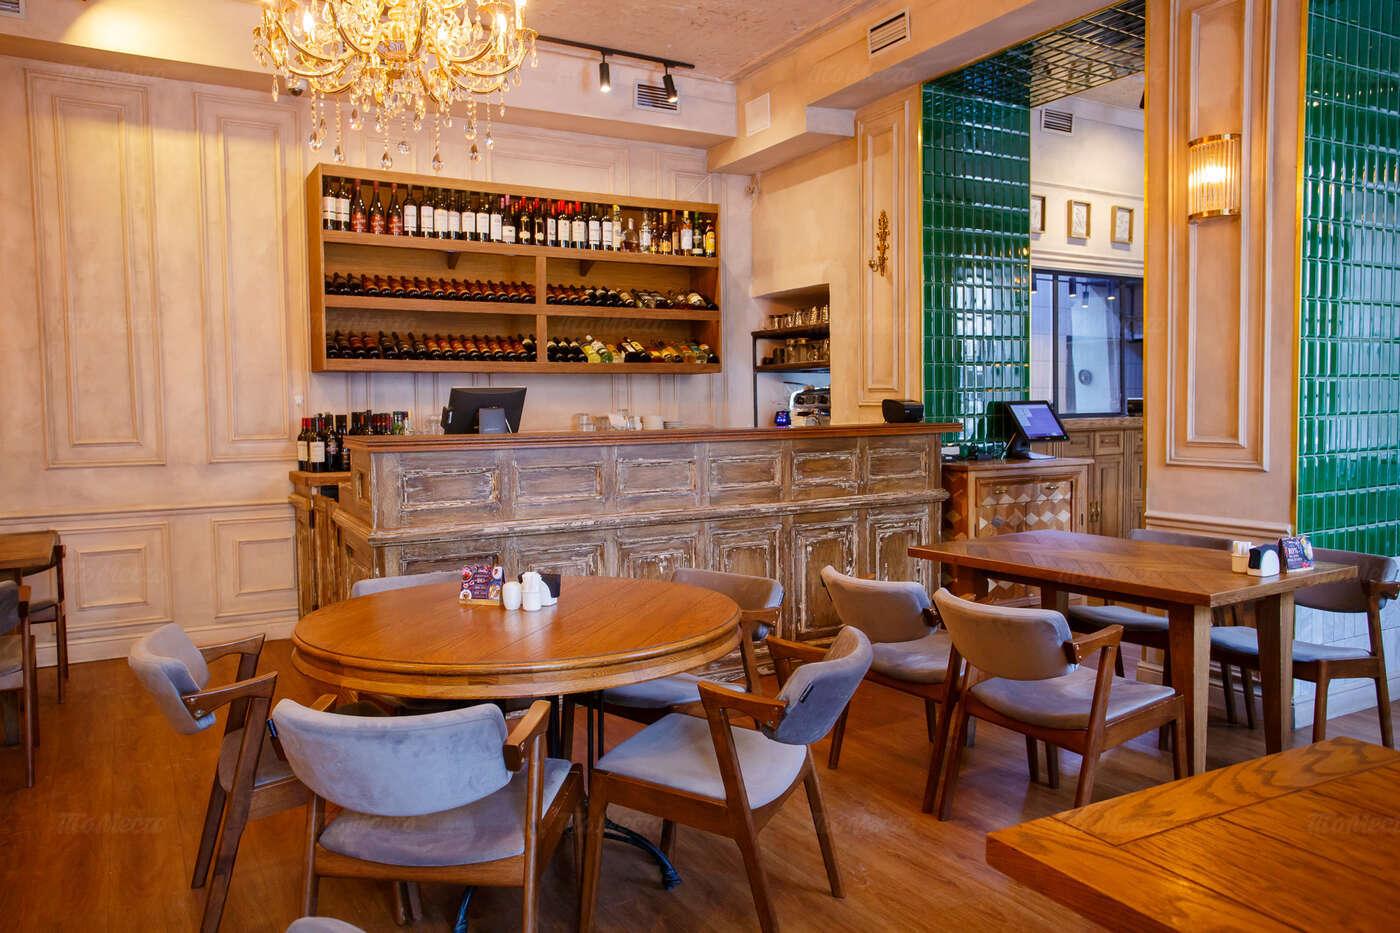 Ресторан Чача на набережной канала Грибоедова фото 19